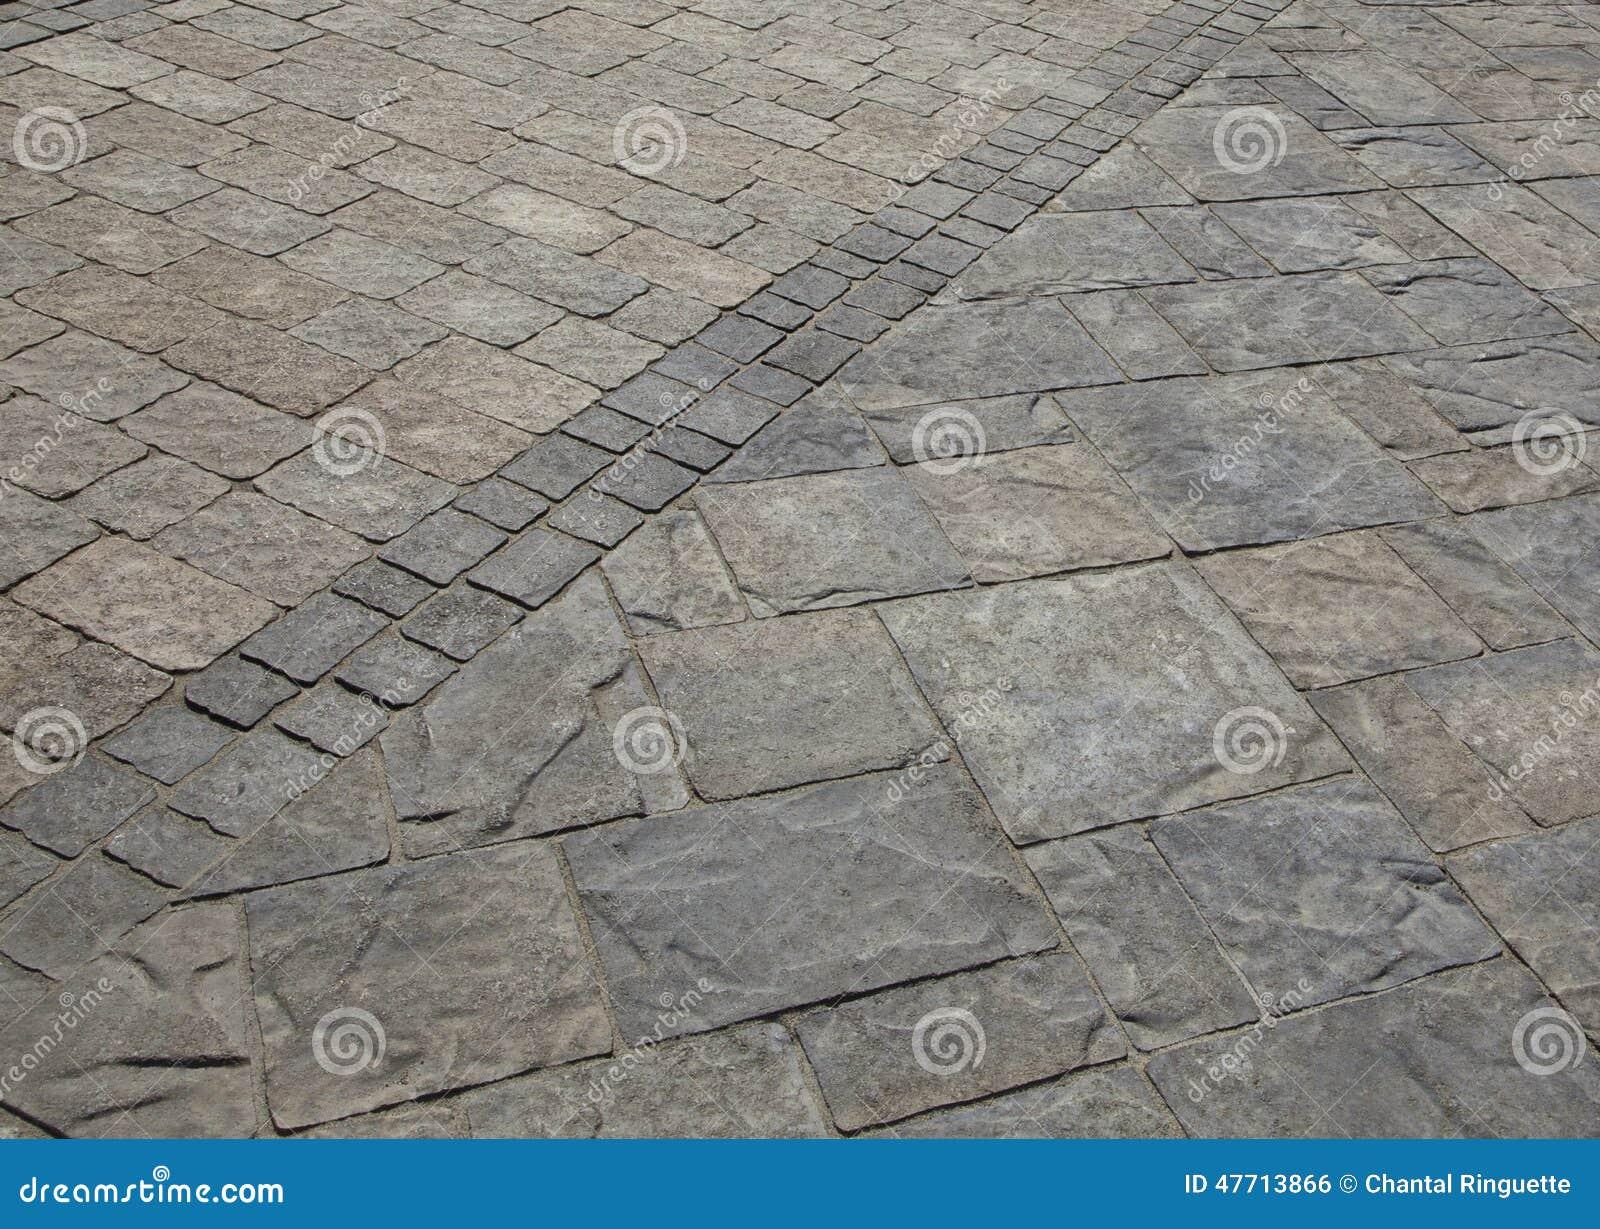 royaltyfree stock photo download stone pavers